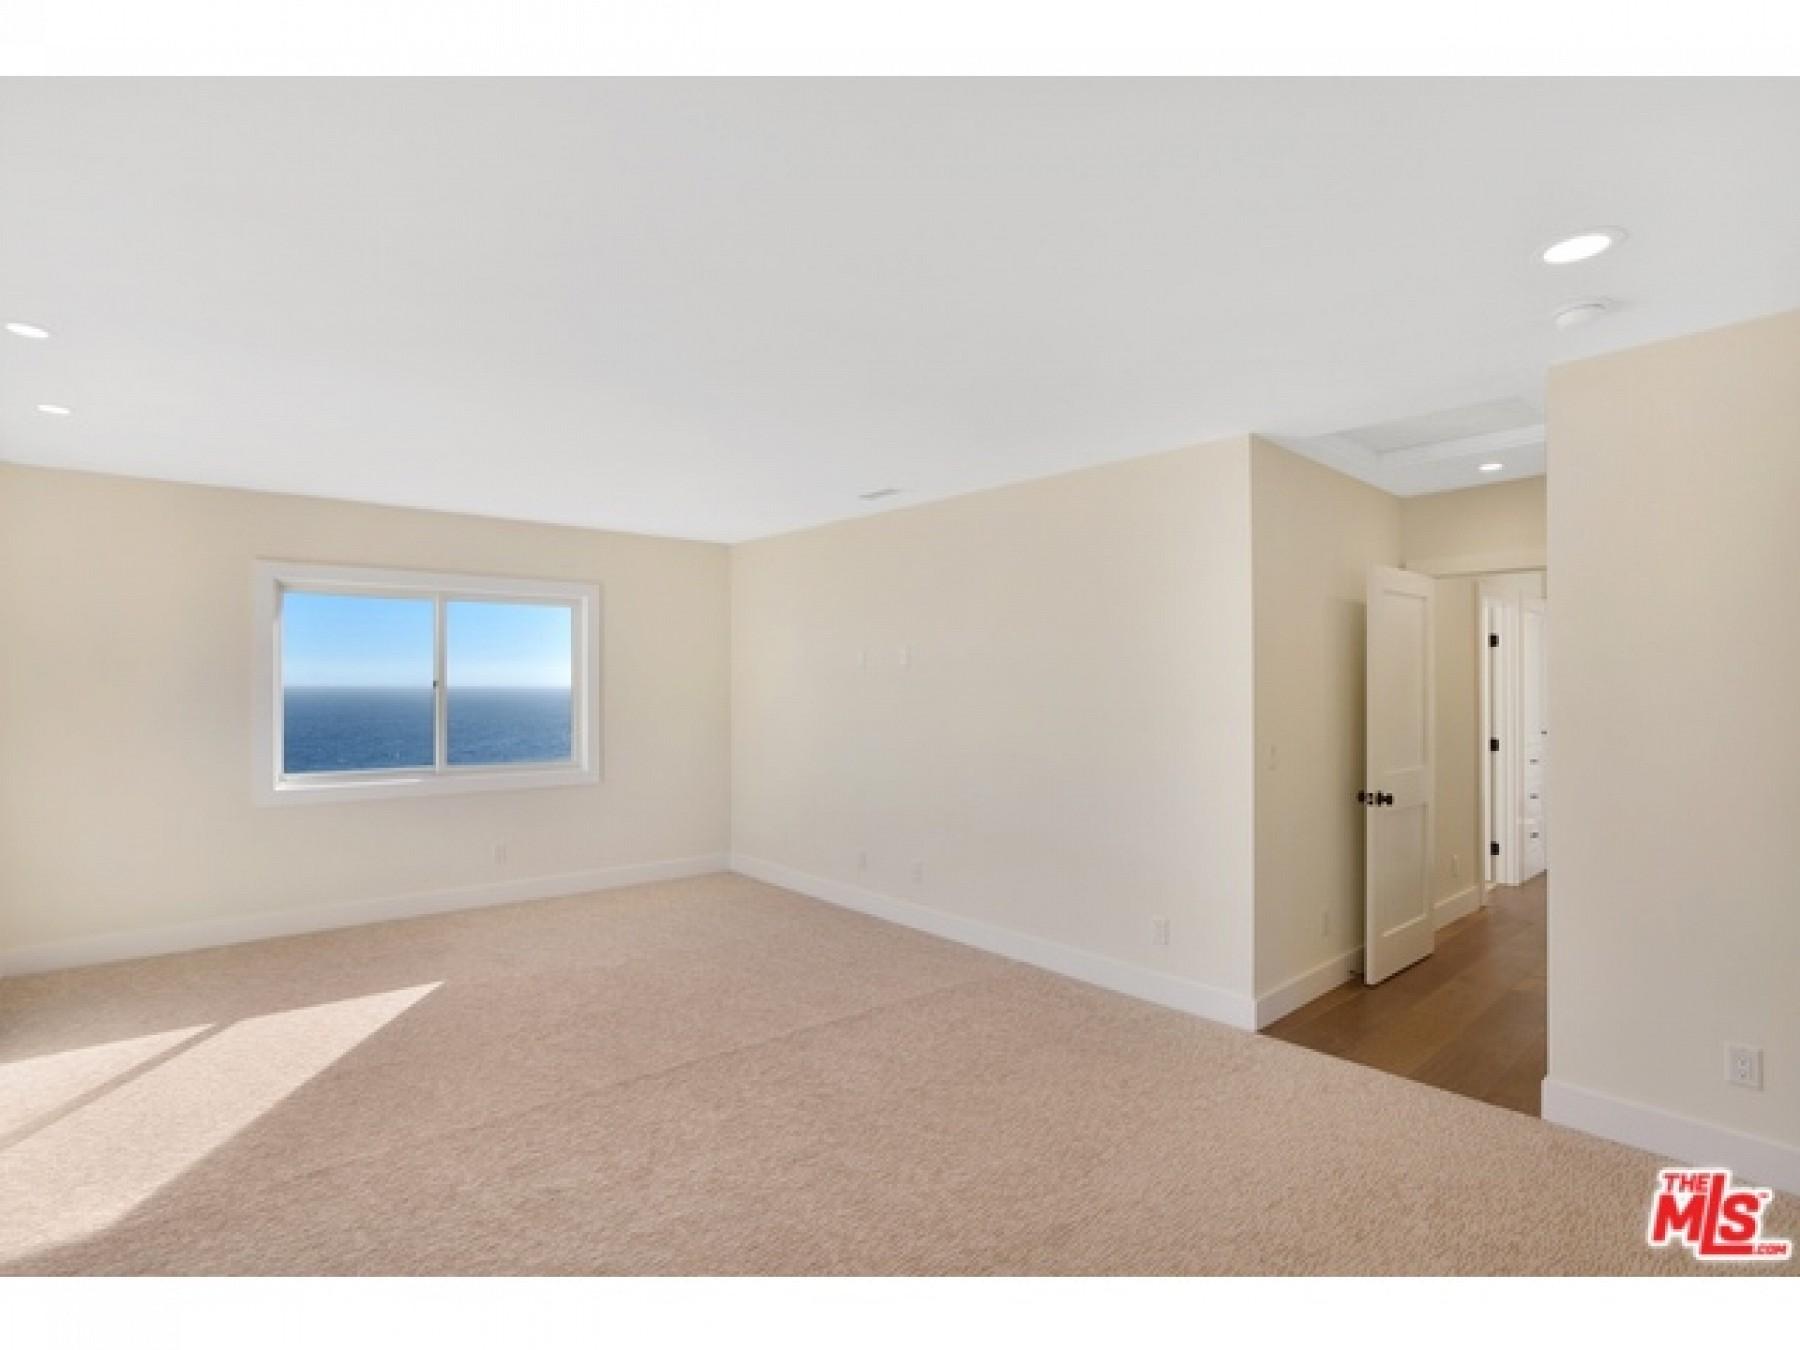 7247 BIRDVIEW Avenue, Malibu, CA 90265